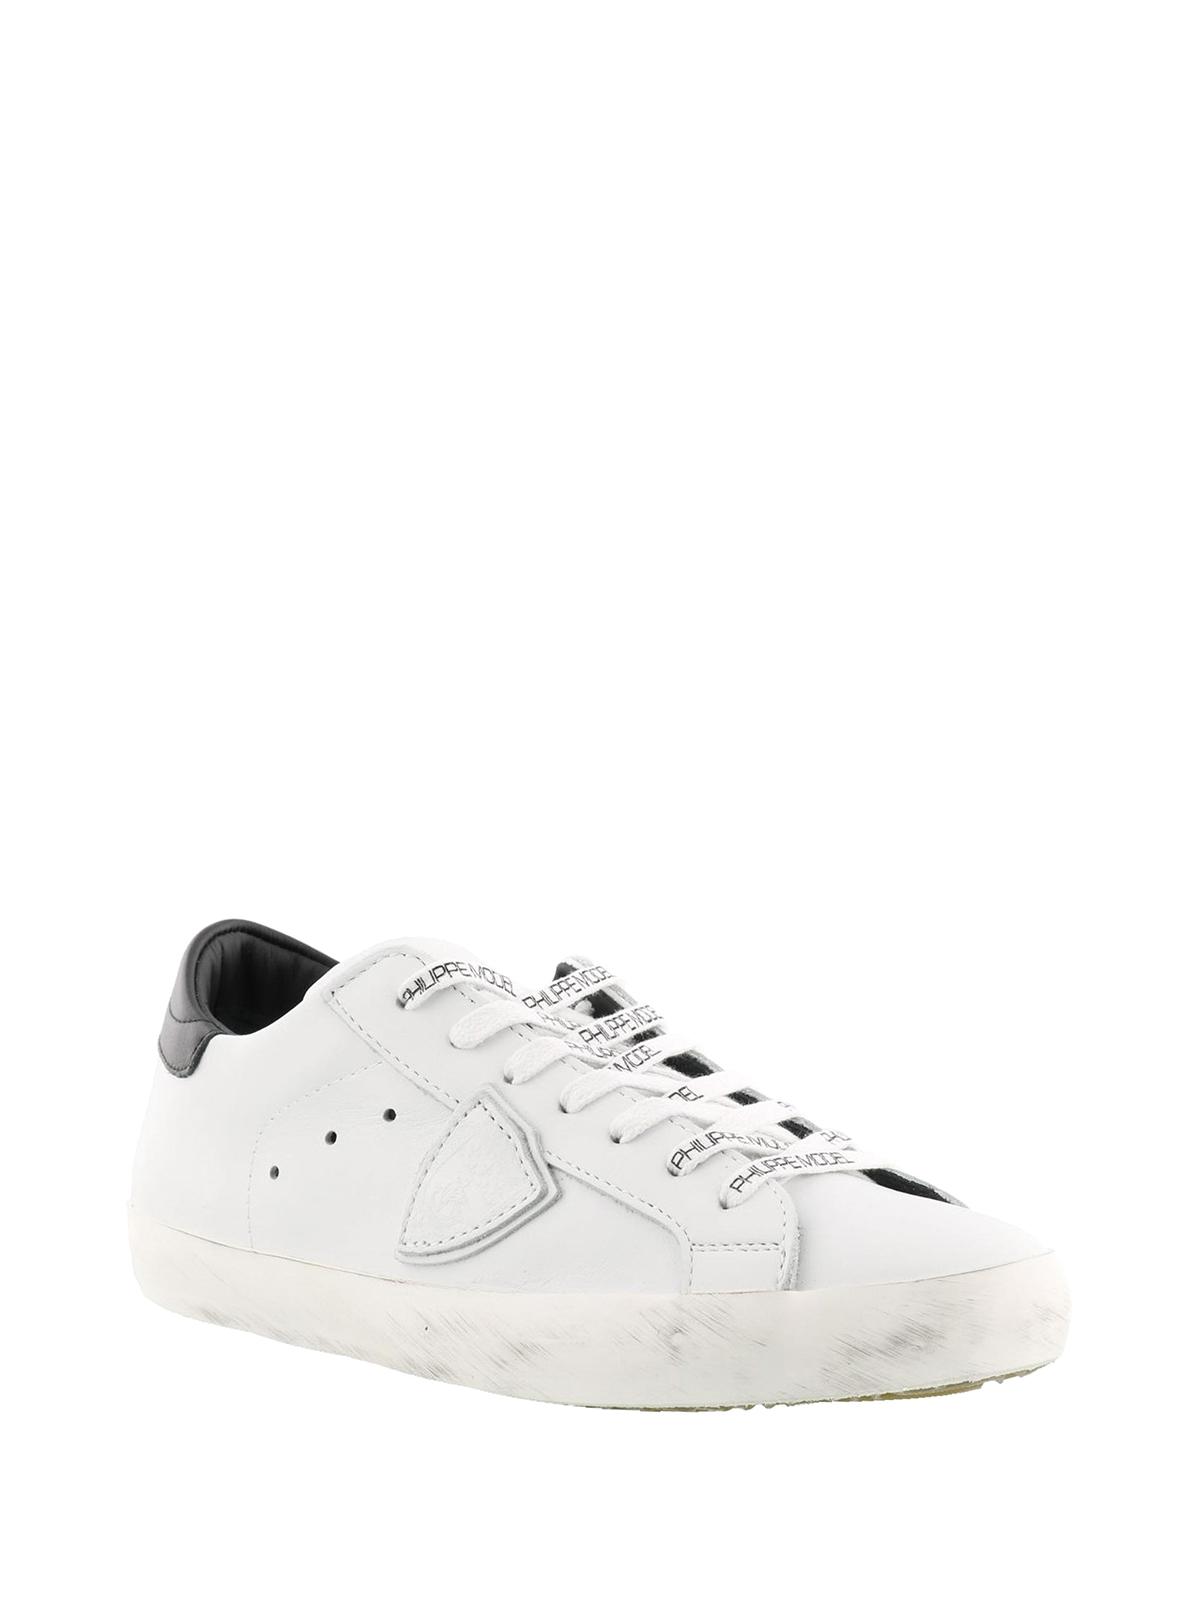 Model Philippe Sneaker Paris Con Pelle In Sneakers Logo V003 Cllu dCCqrwf 18bdeb65c61